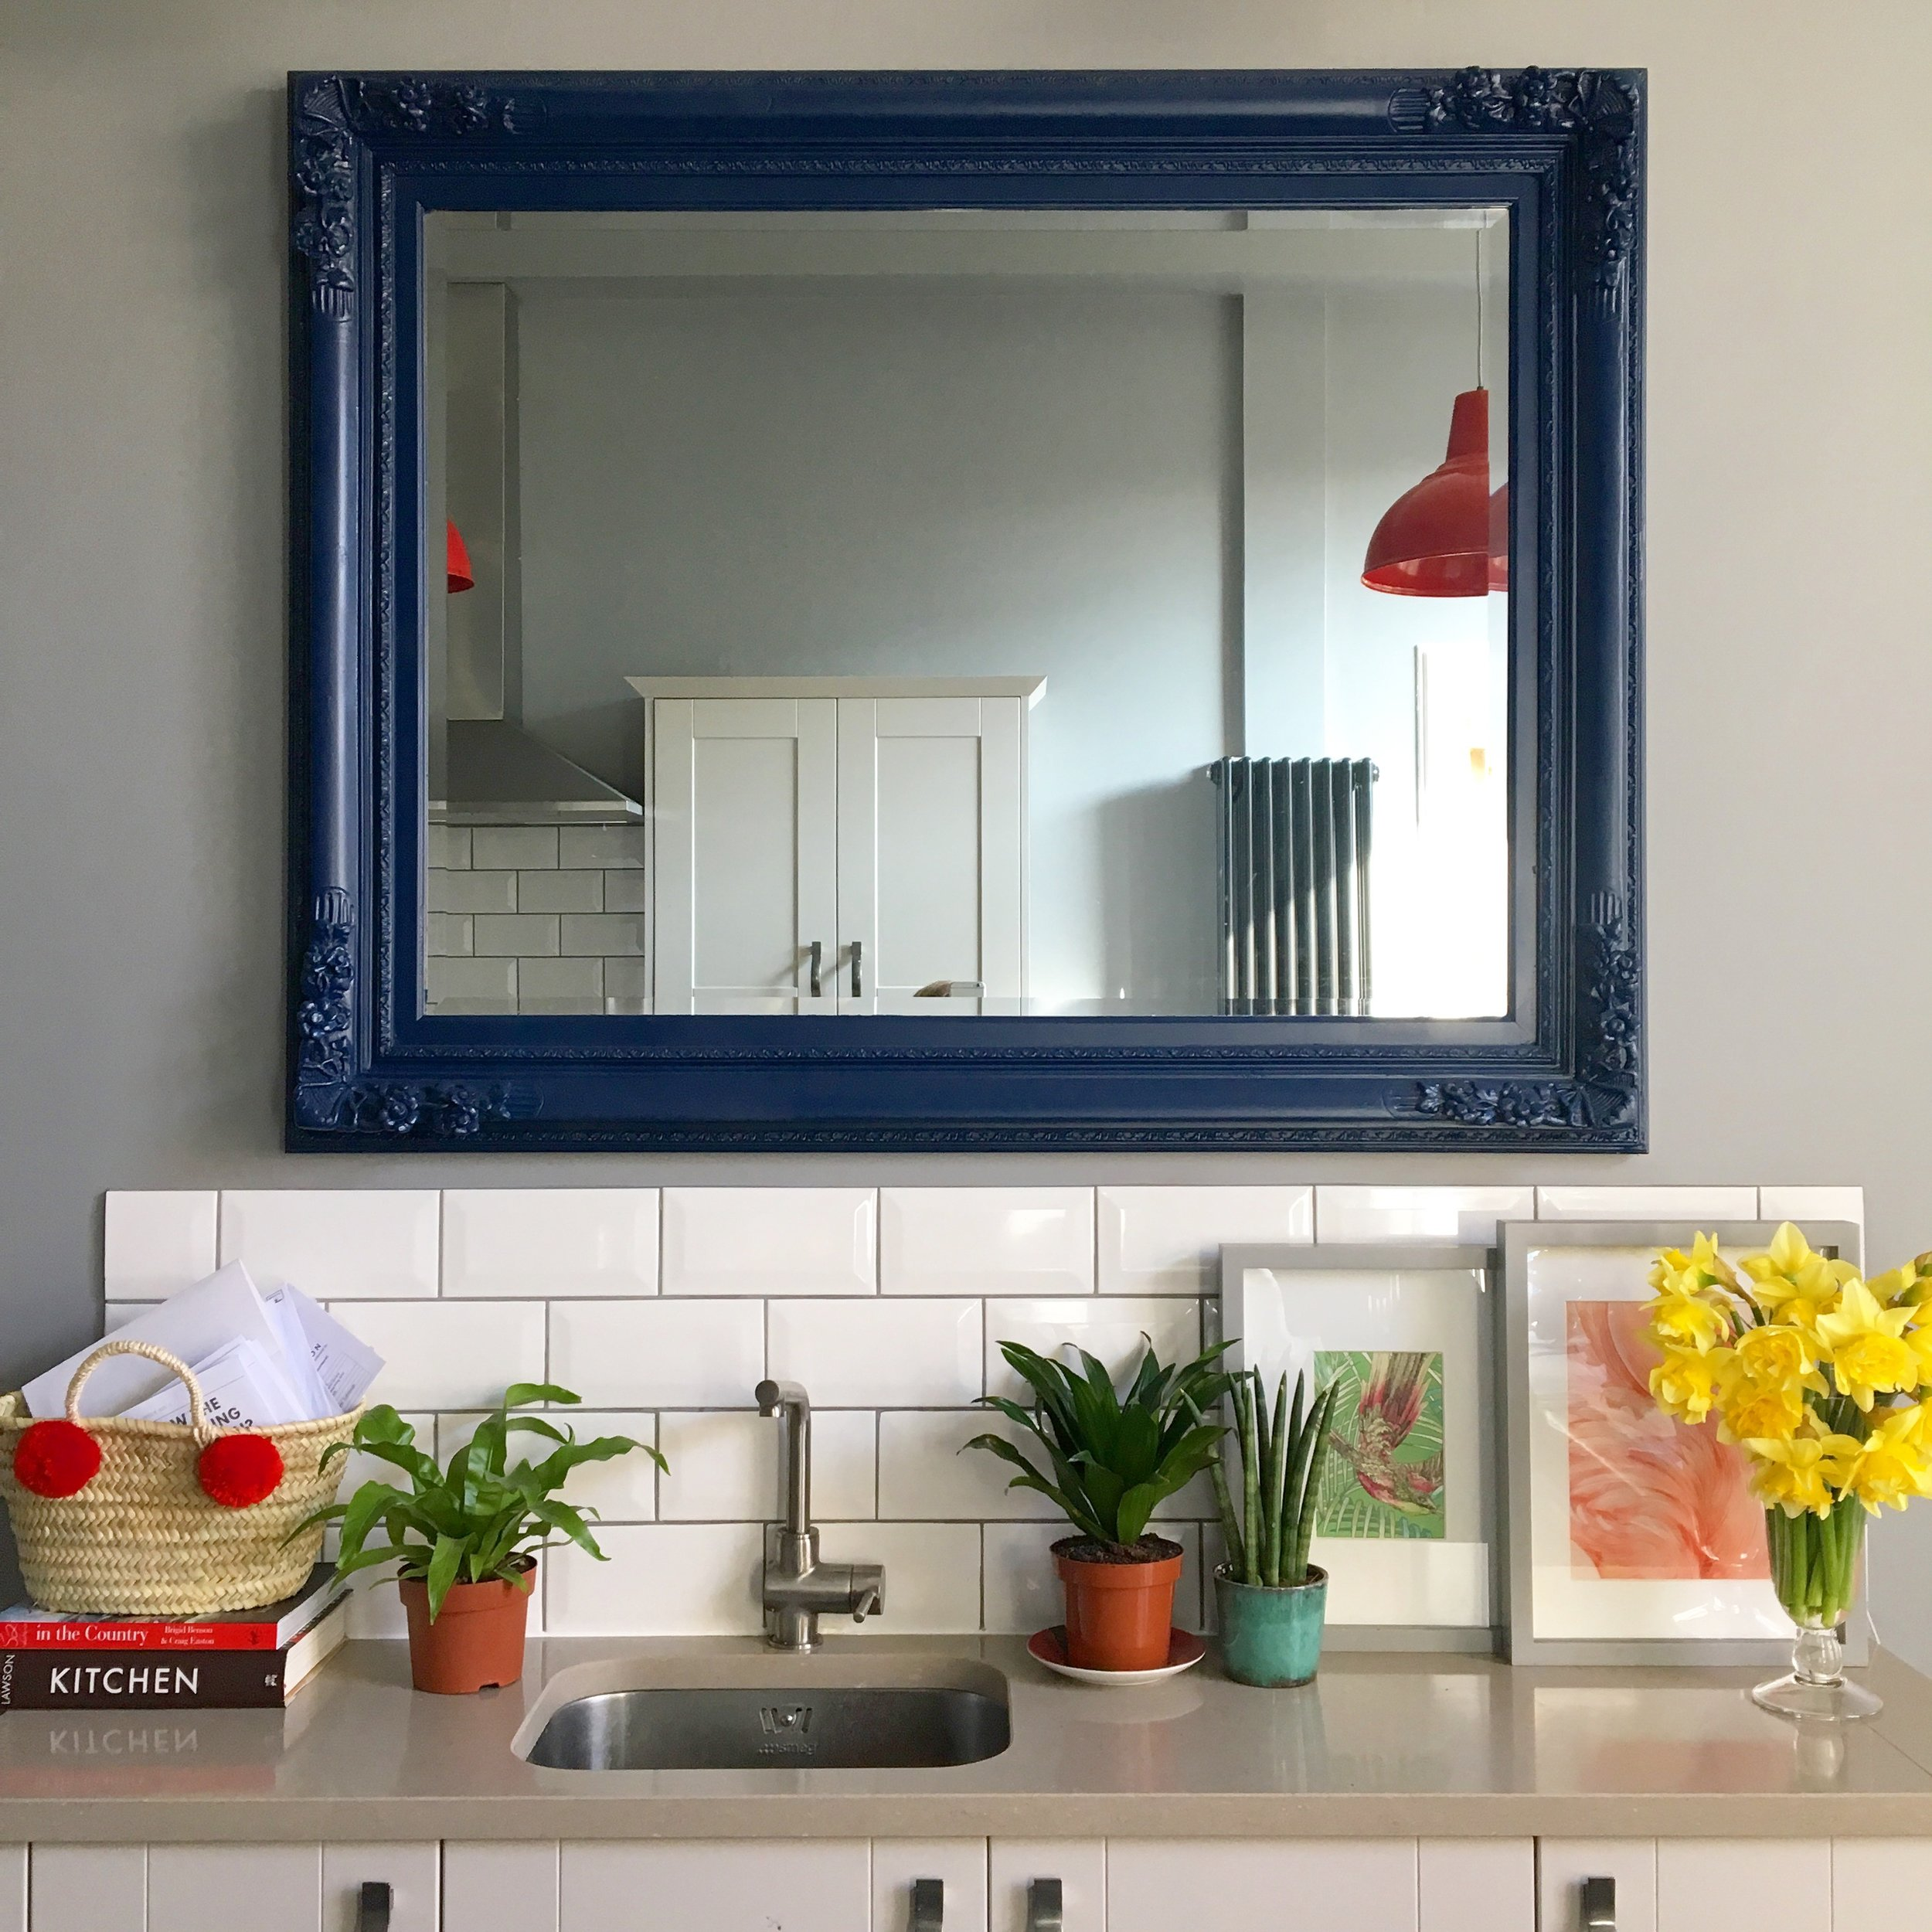 Liznylon_kitchen_feature_mirror.jpg